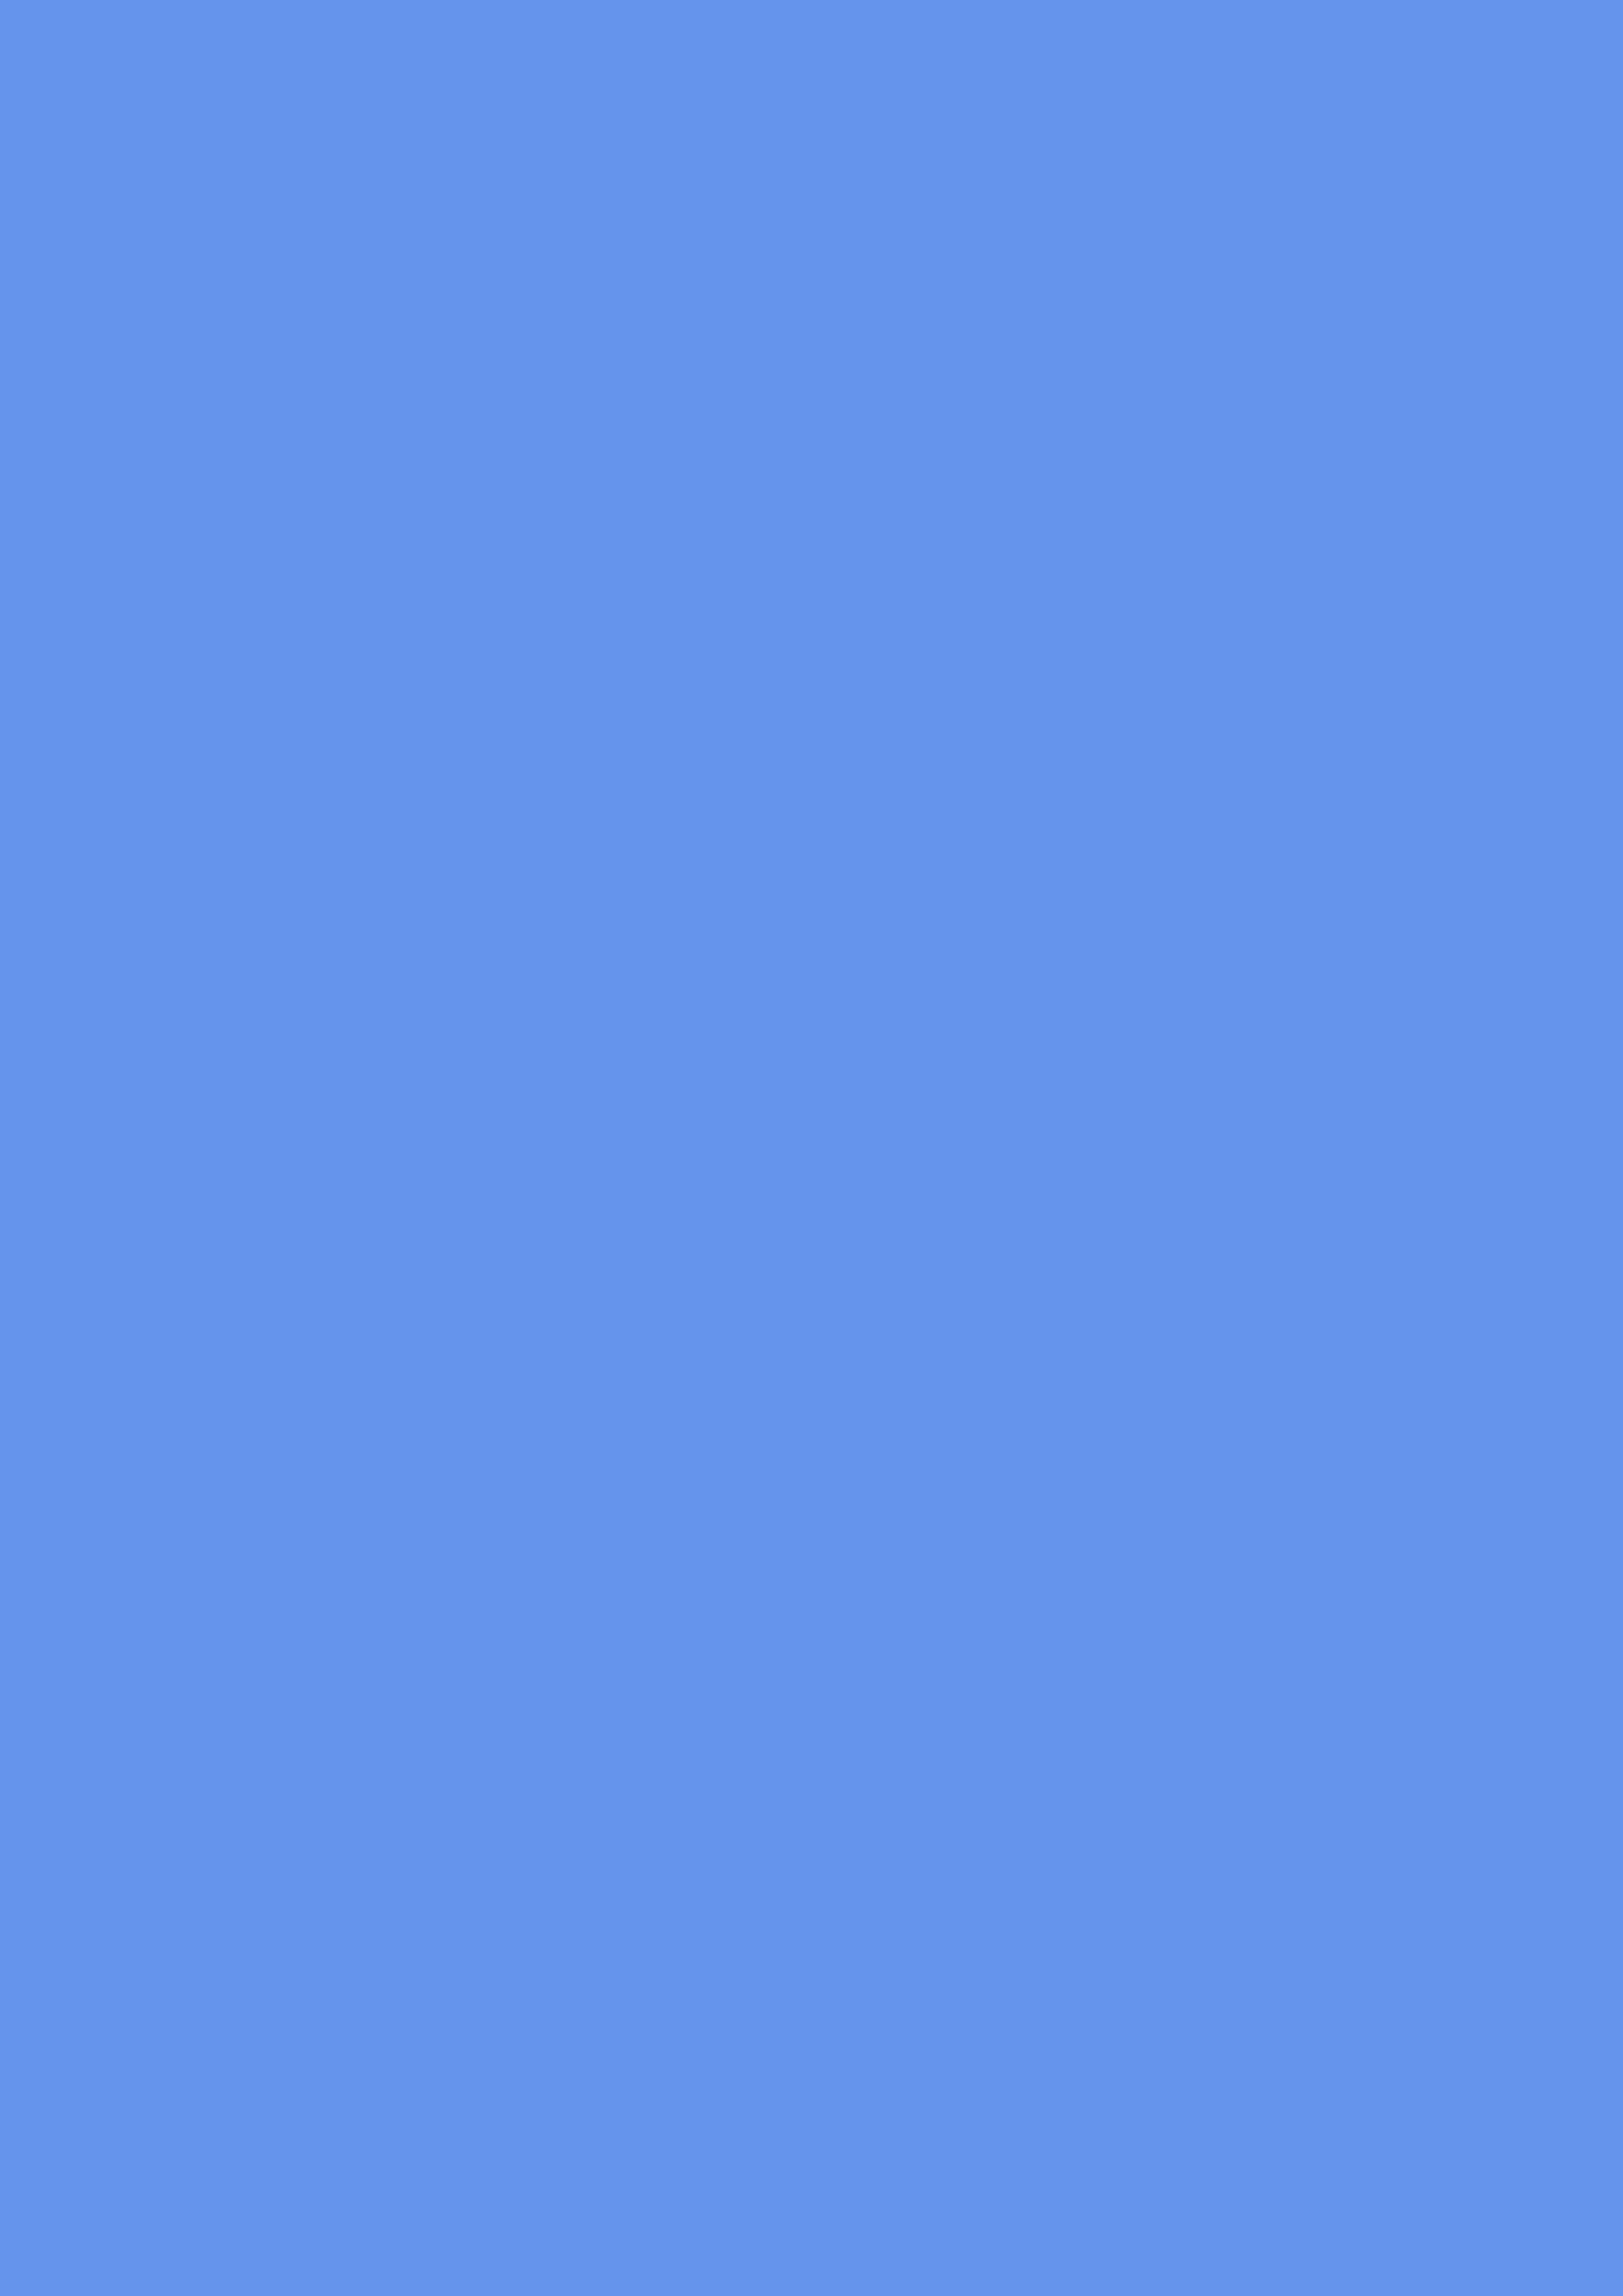 2480x3508 Cornflower Blue Solid Color Background